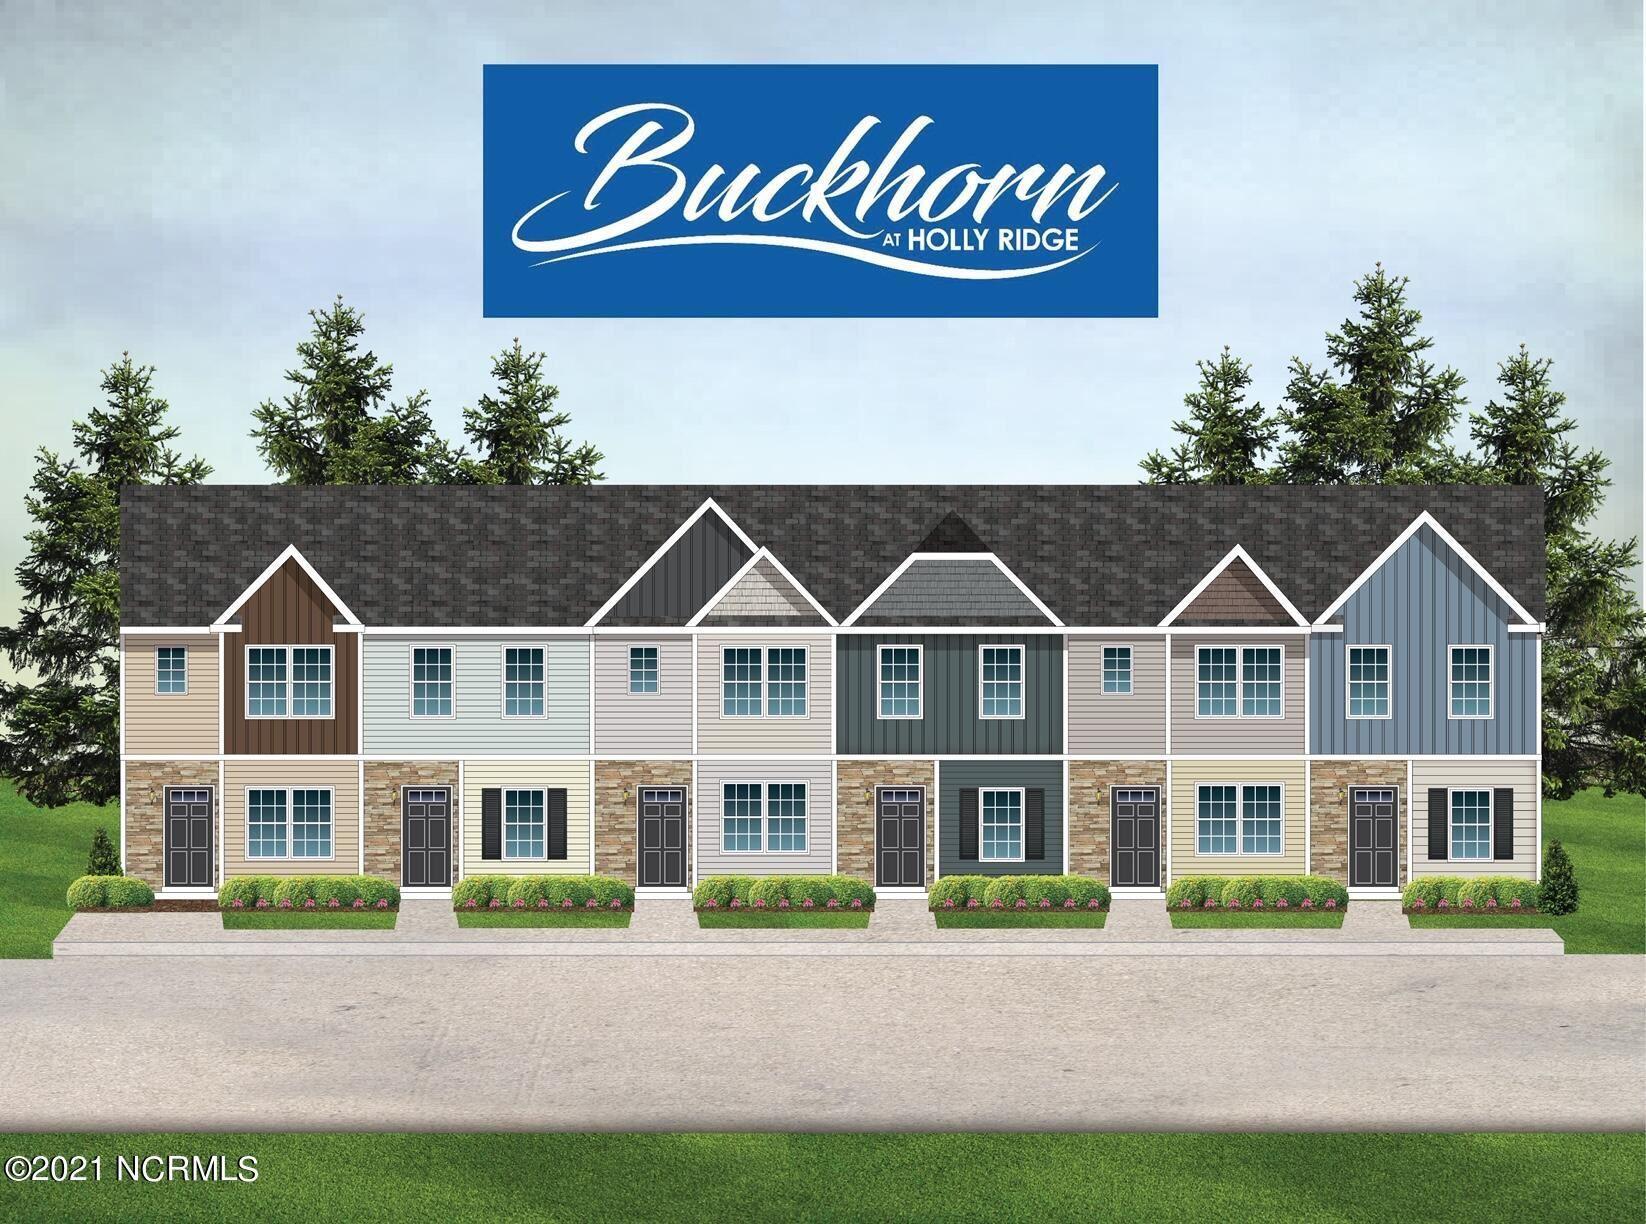 Photo of 180 Buckhorn Ave, Holly Ridge, NC 28445 (MLS # 100294381)